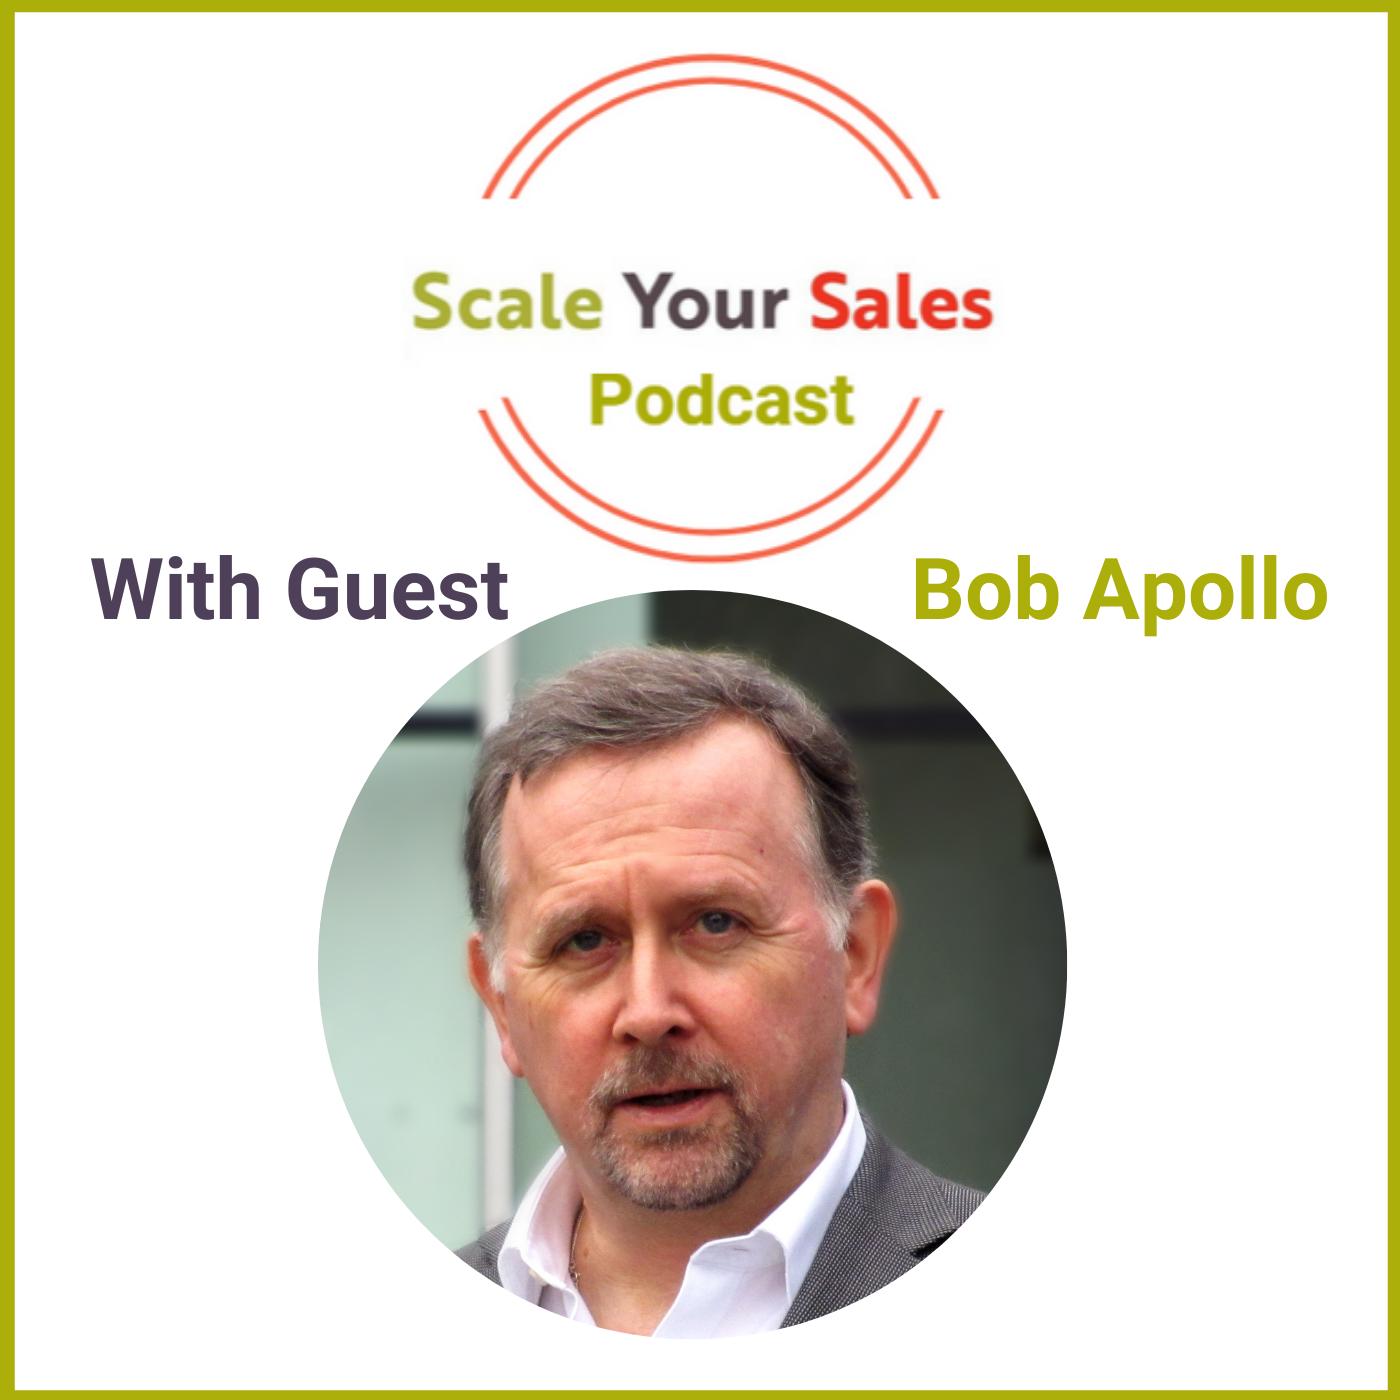 Episode 017 Bob Apollo: The Value Gap Critical in Creating the Consensus to Change